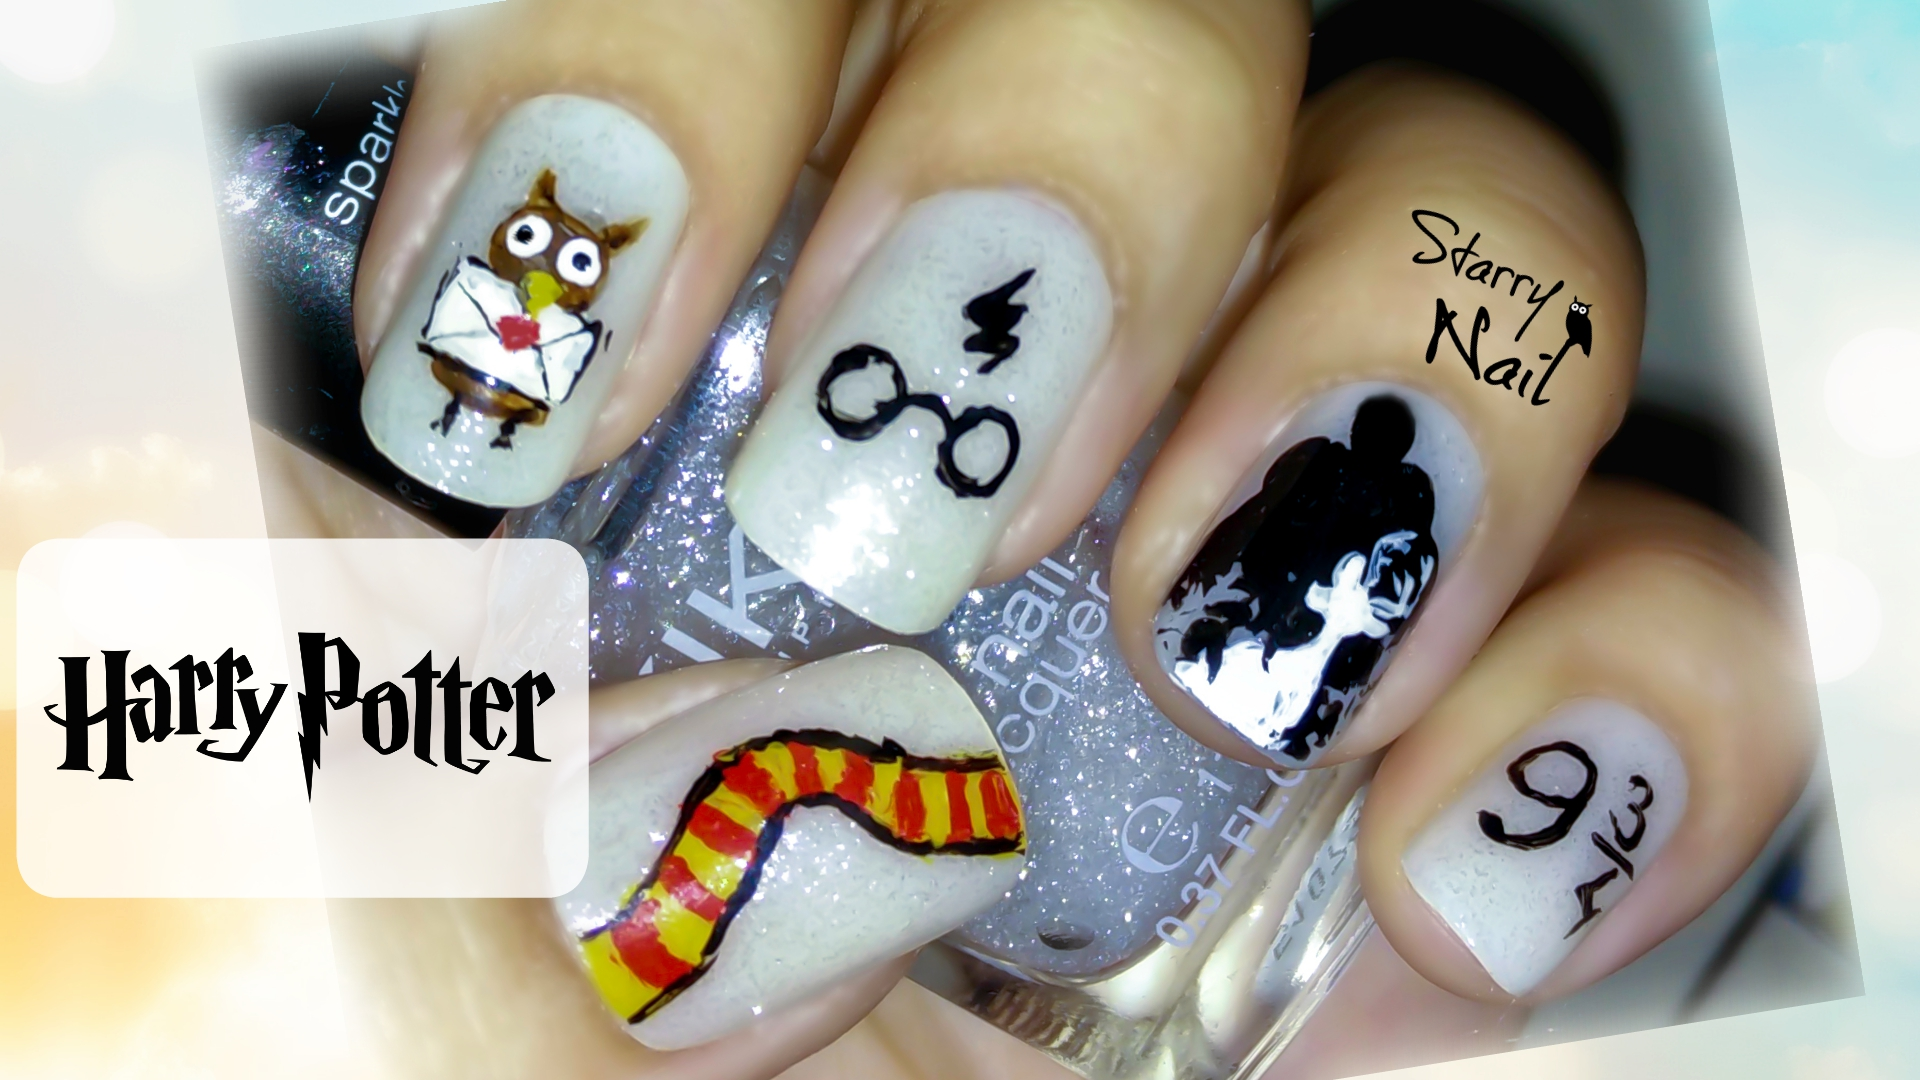 Harry potter cute nail art starrynail 31 july 2015 1920 1080 harry potter cute nail art prinsesfo Images